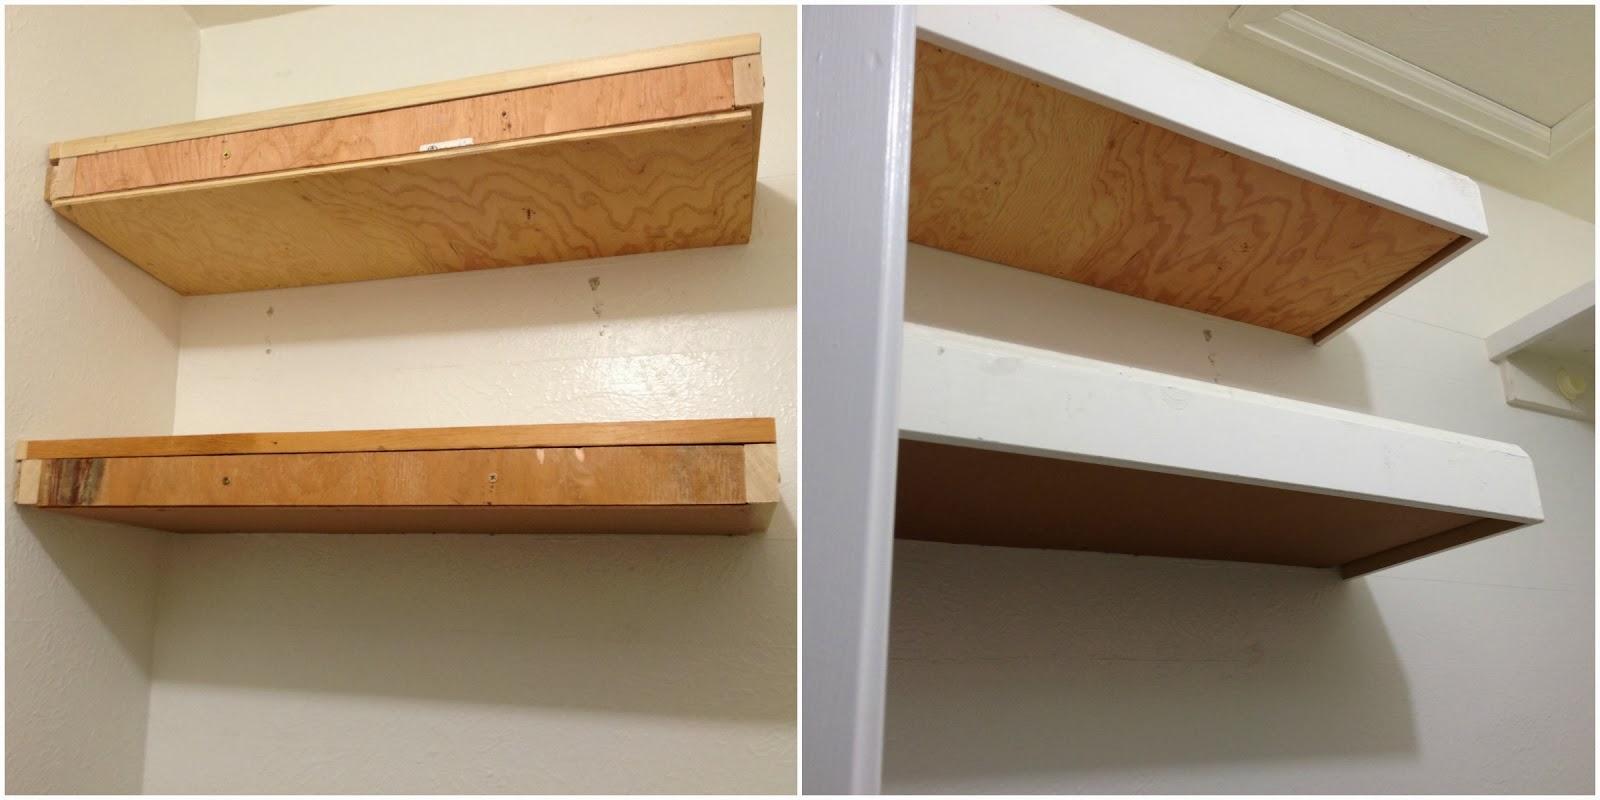 Shoe Shelf, bench and floating shelves, Master Closet Makeover ...